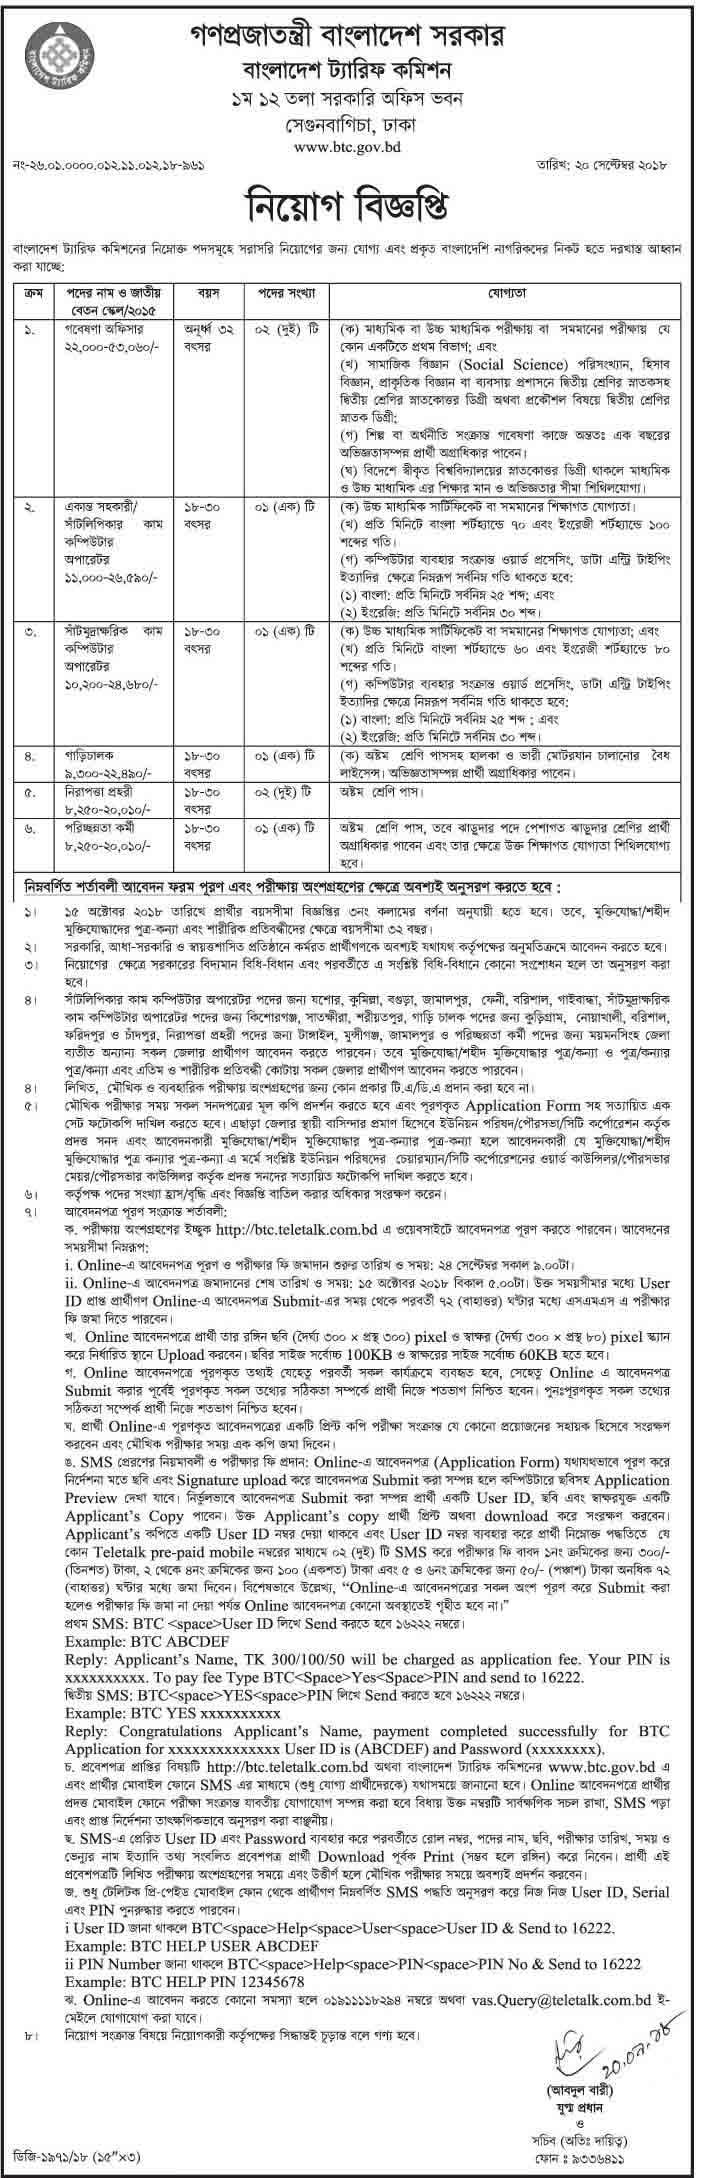 Bangladesh-Tariff-Commission-BTC-Job-Circular-2018